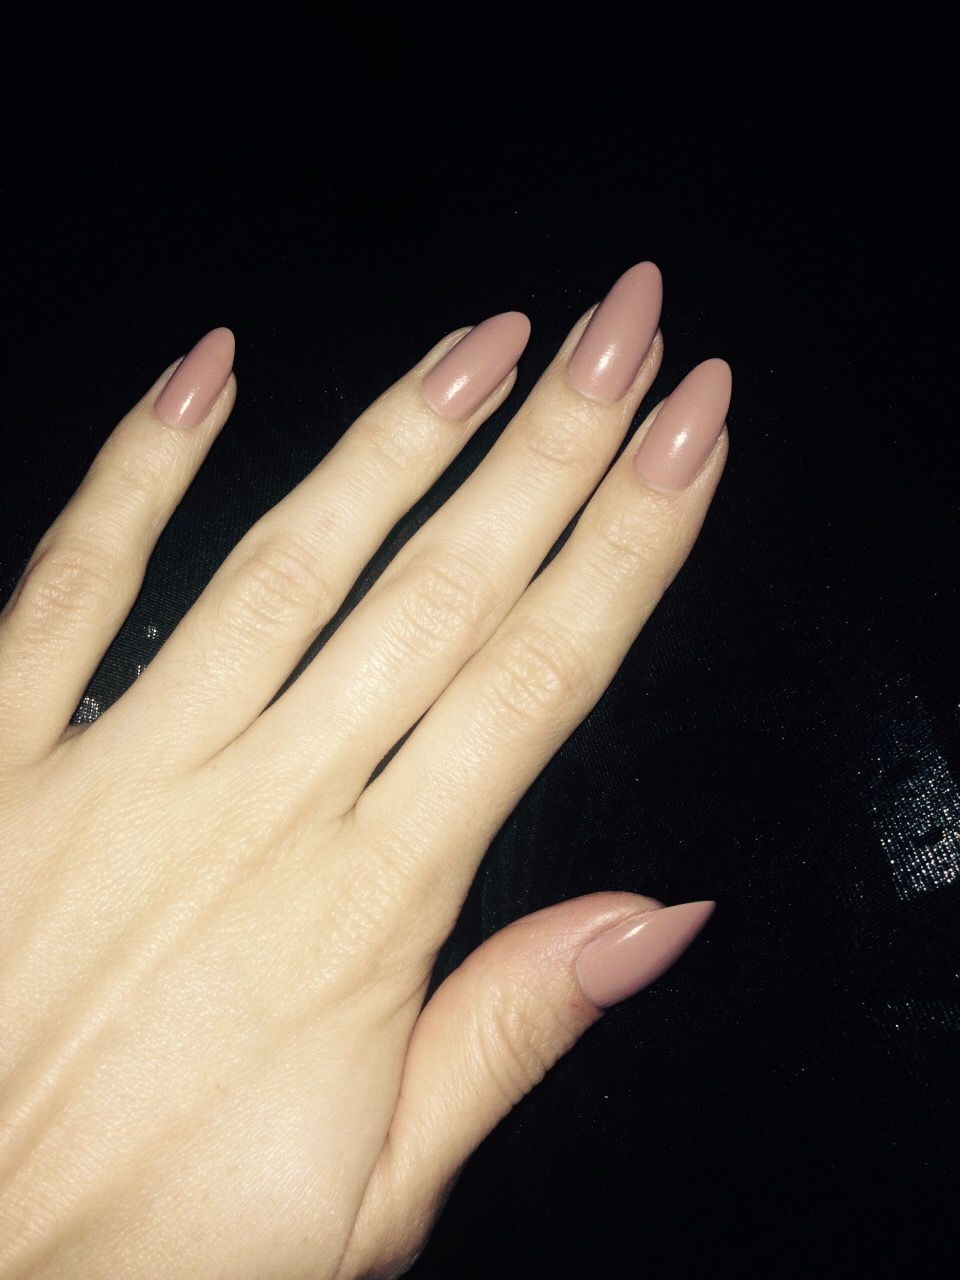 Natural oval nude nails   ~ Nails ~   Pinterest   Nude nails